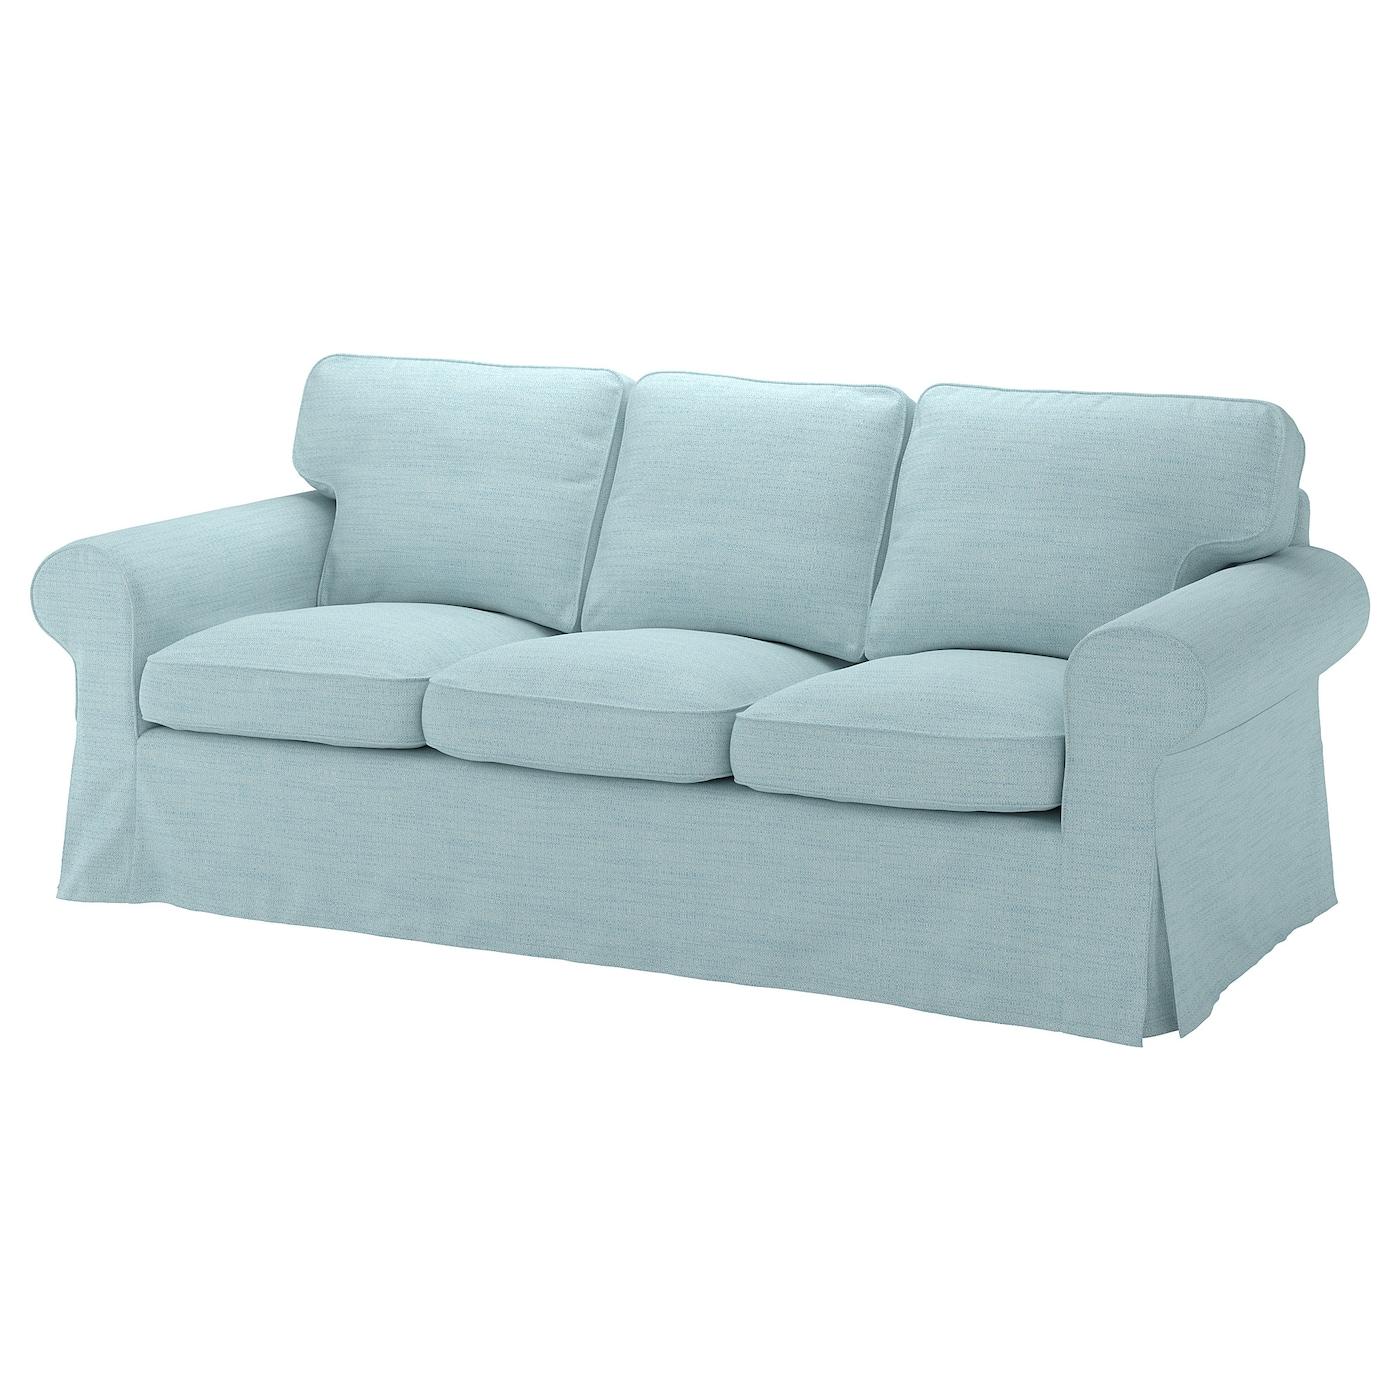 Ektorp Cover Three Seat Sofa Hillared Light Blue Ikea